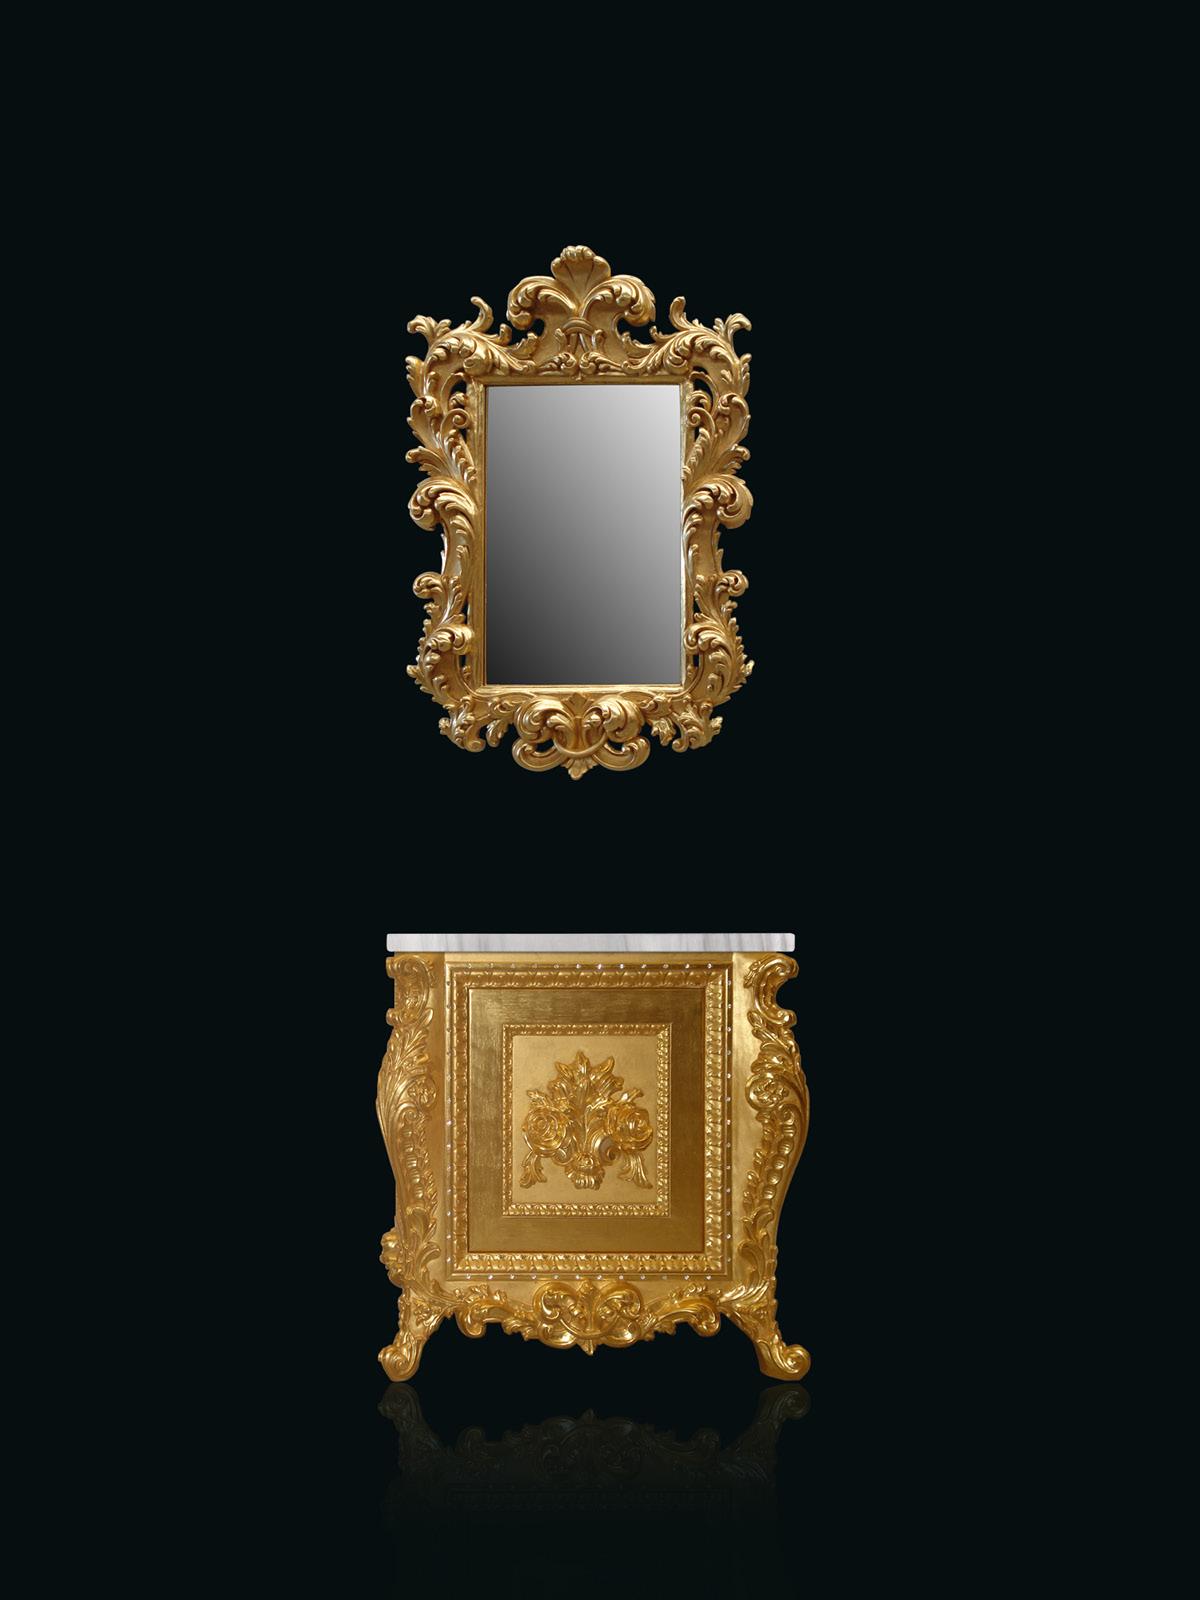 Custom vanities finished in 24K golden leaf